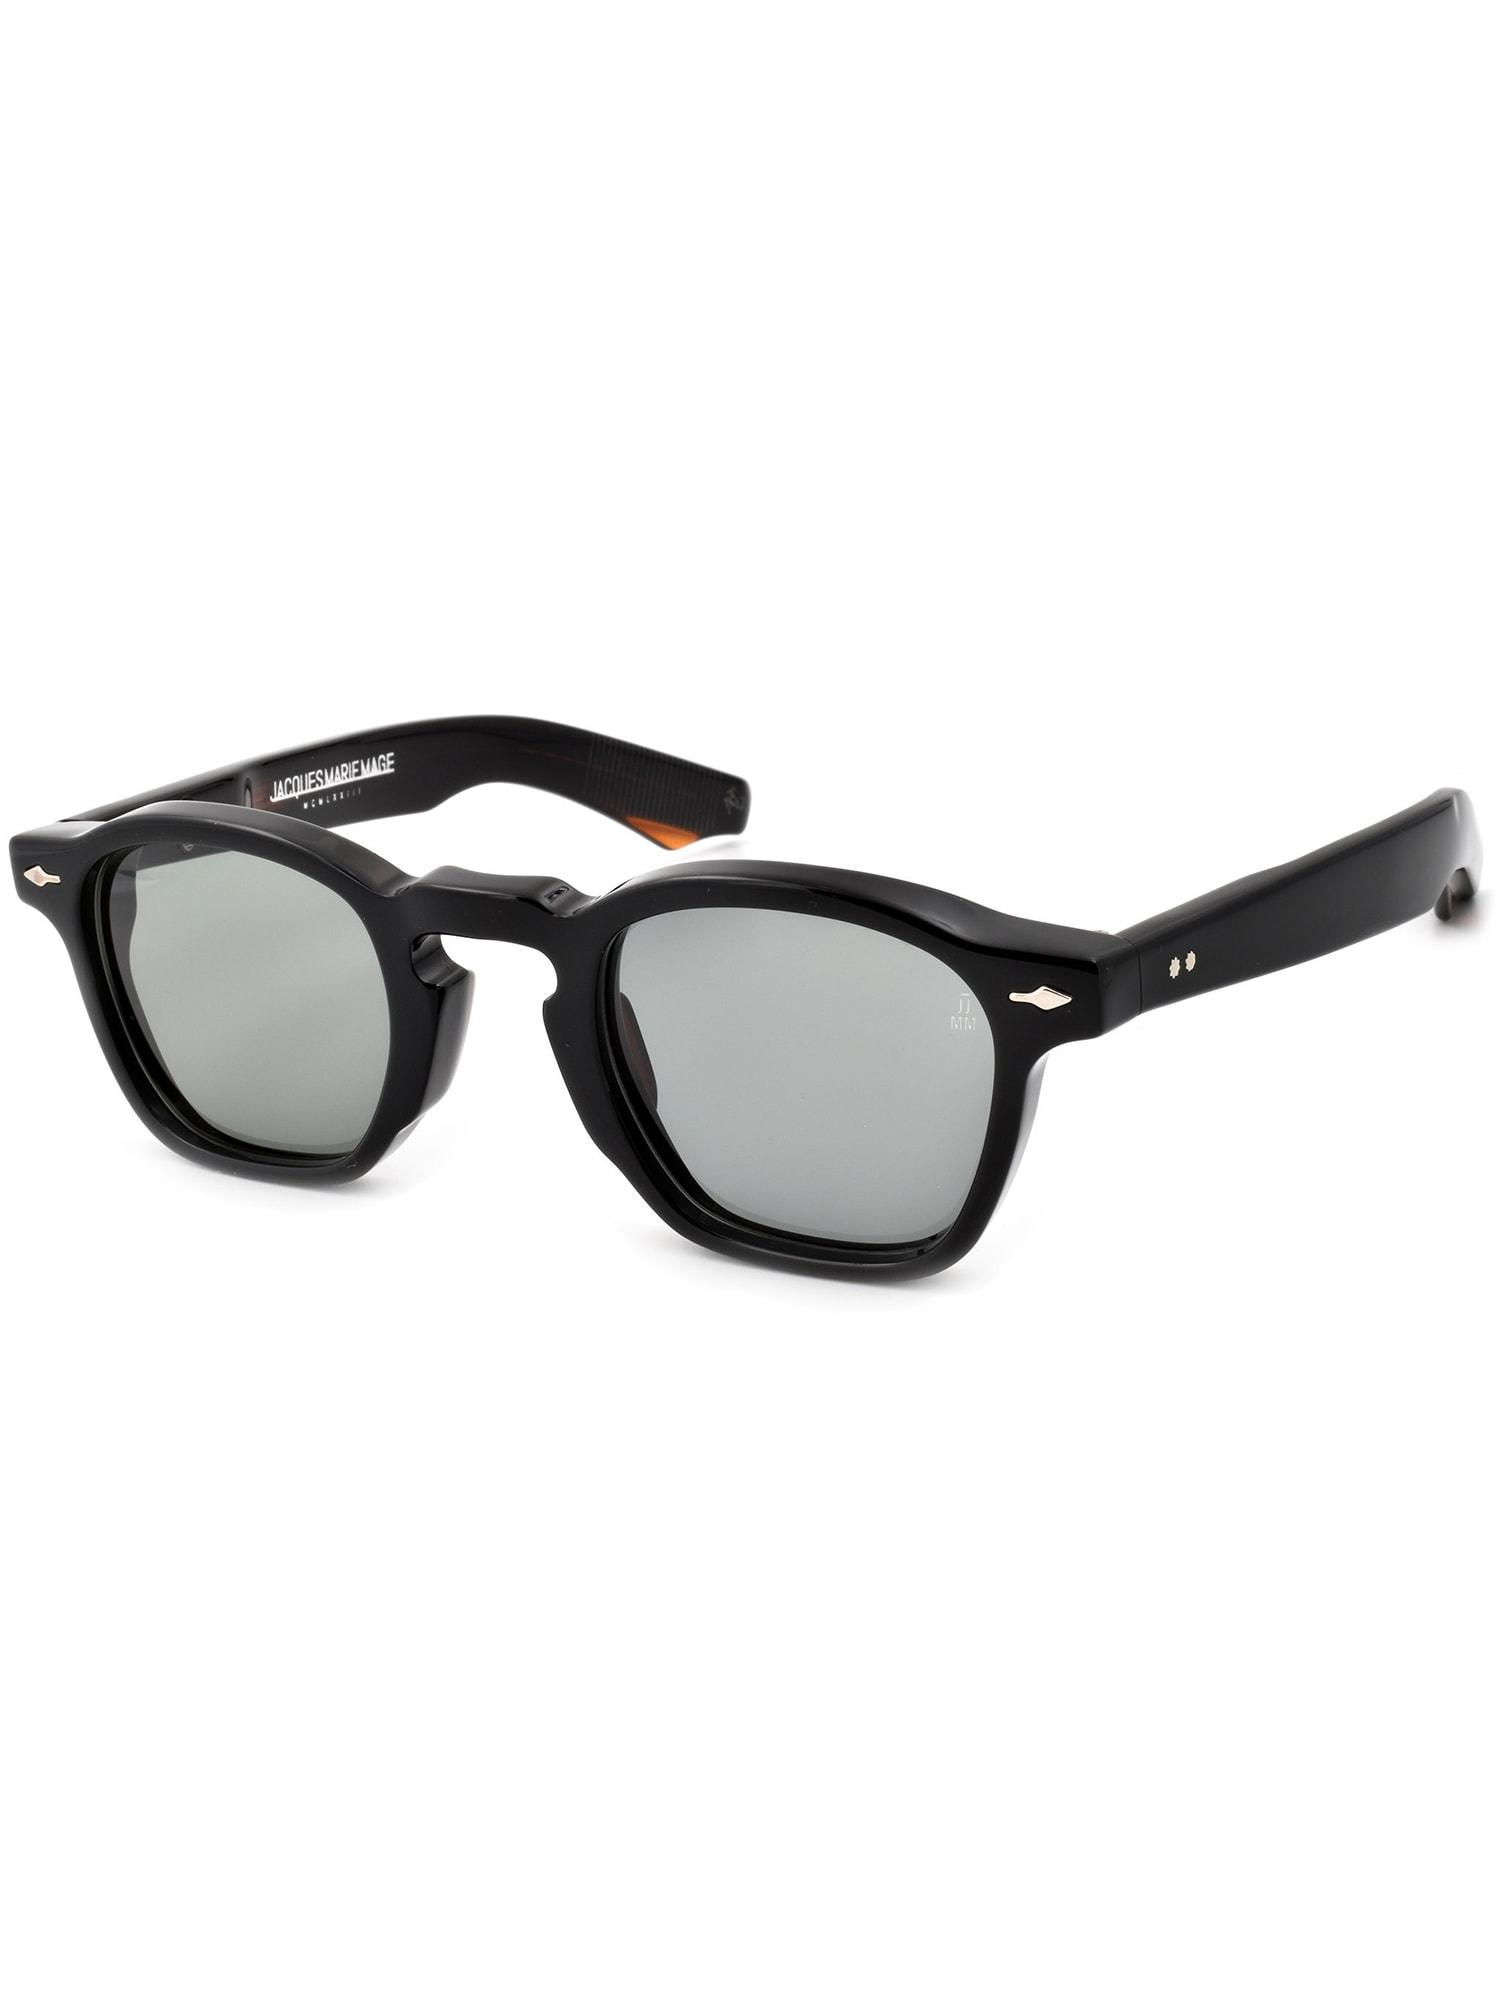 ZEPHIRIN Sunglasses